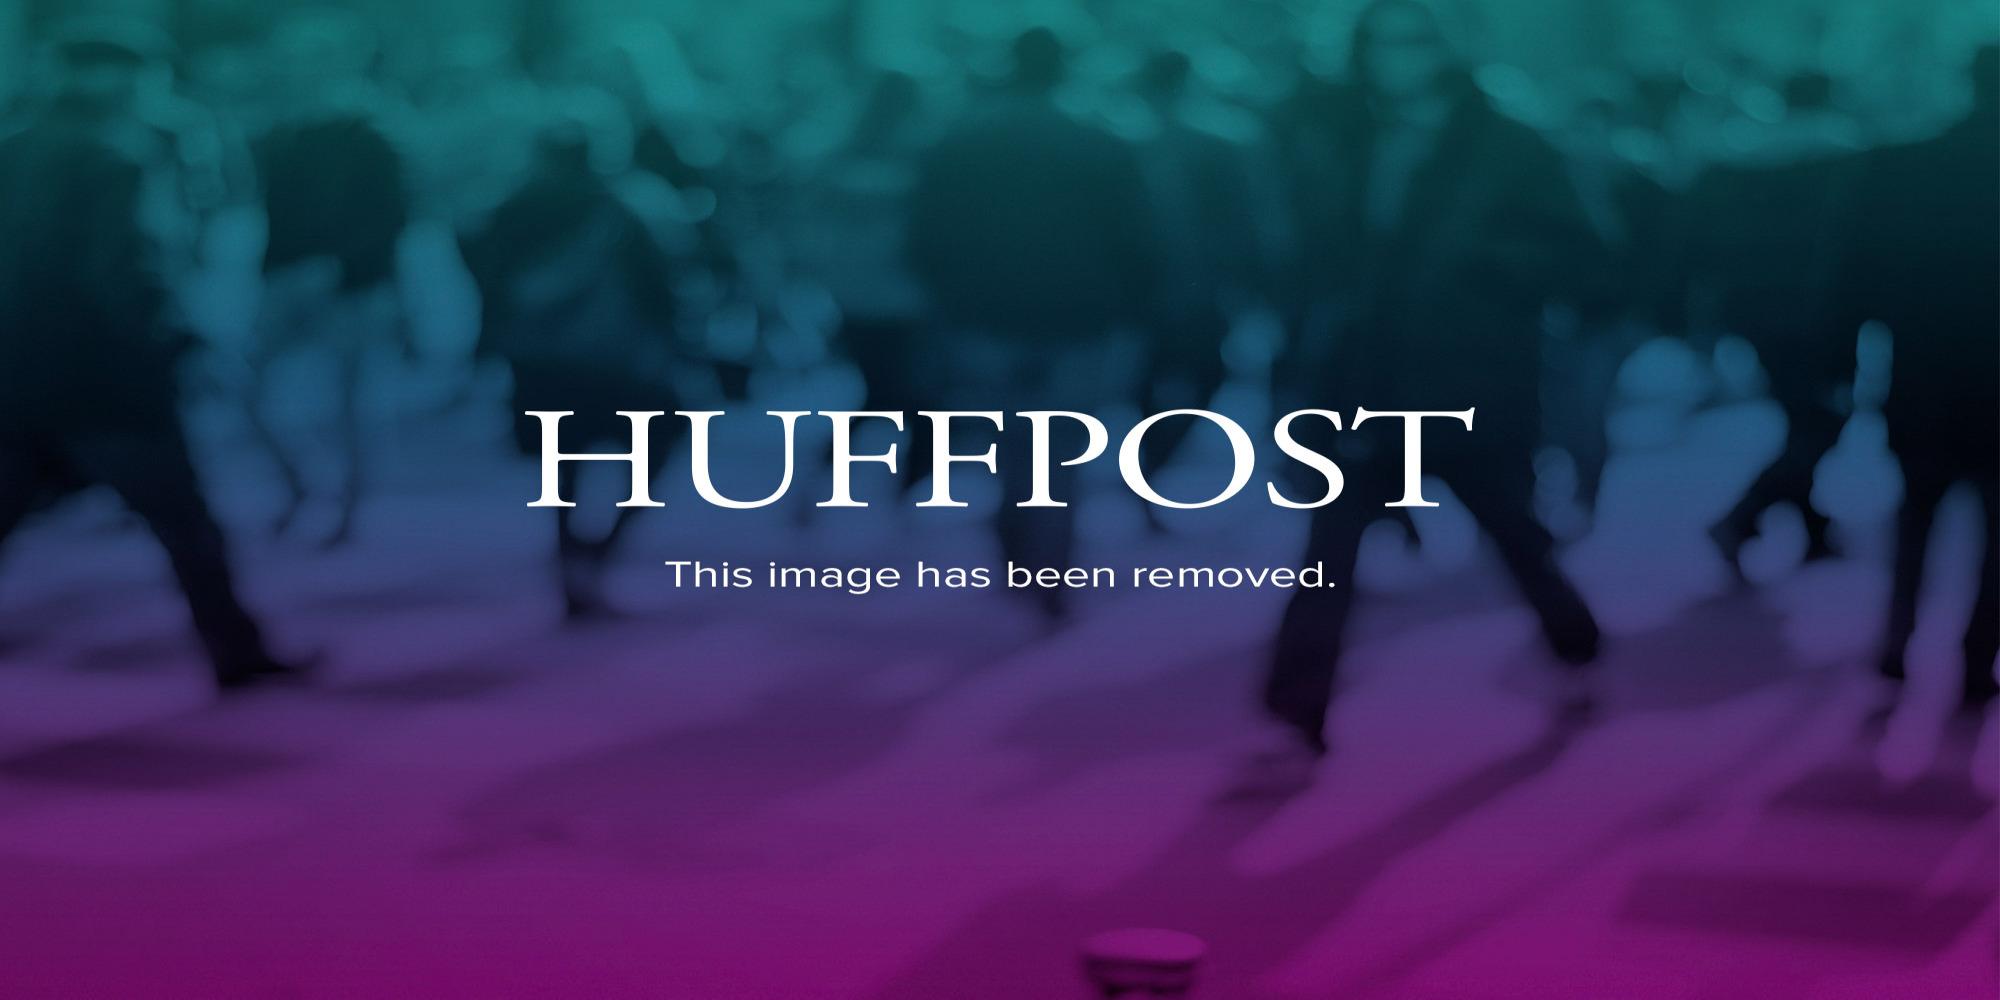 Photo (c) HuffPost 2015